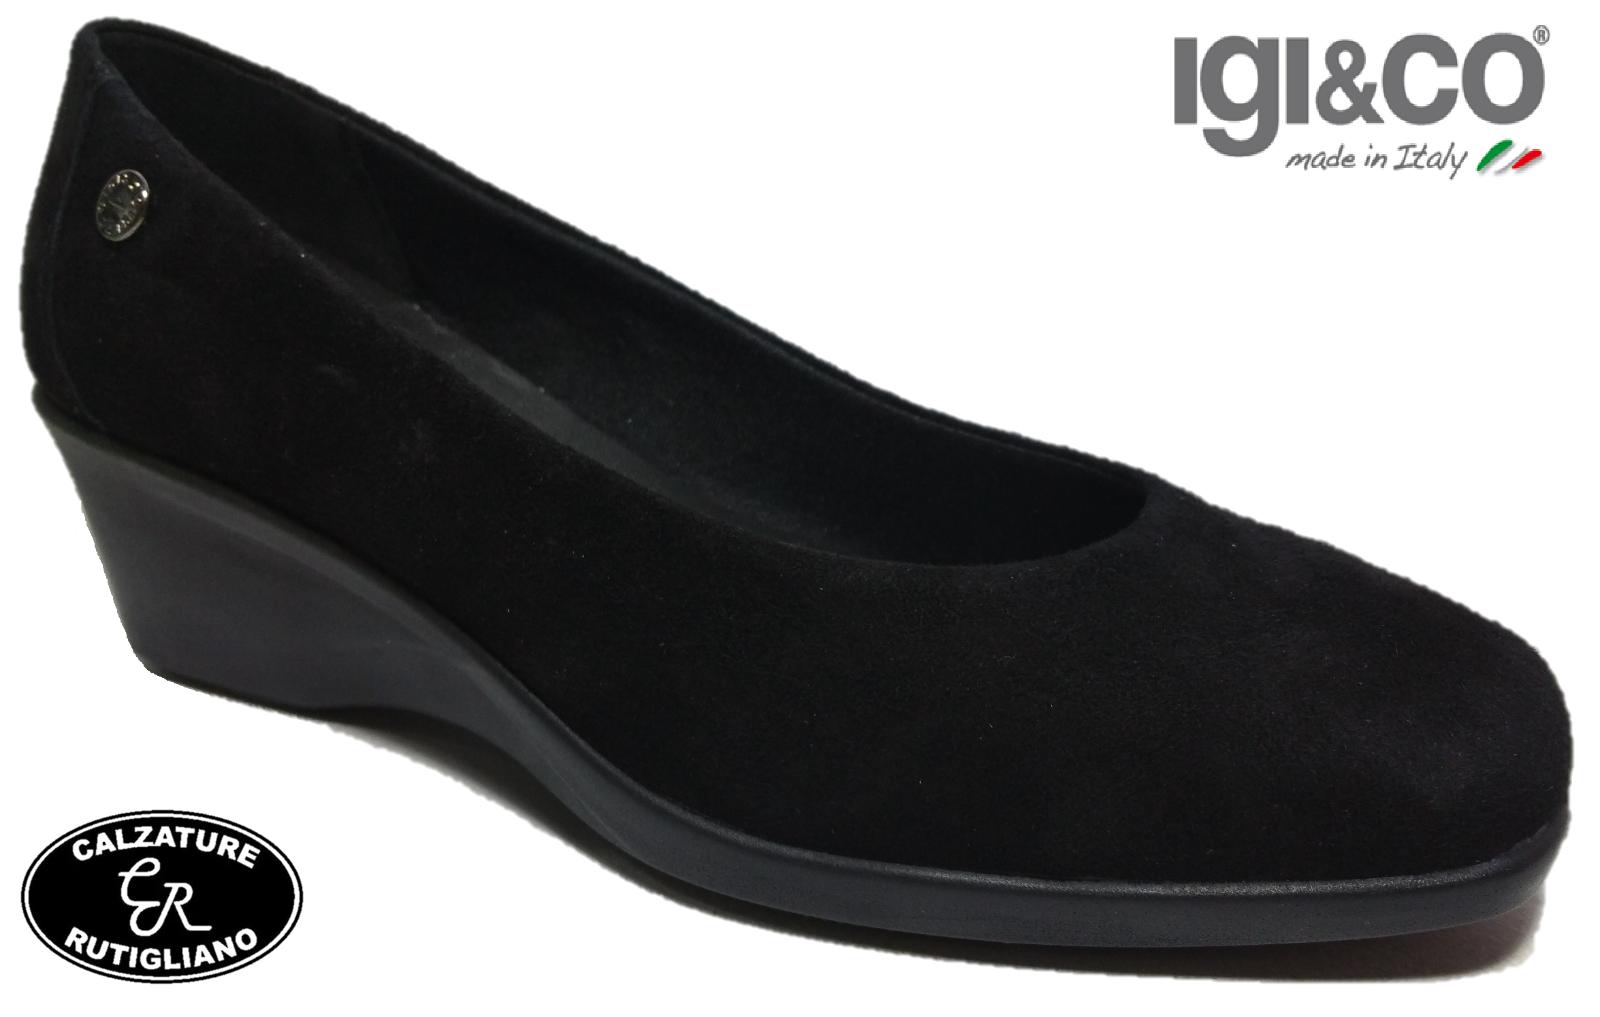 IGI&CO chaussures femmes DECOLTE' ZEPPA SCAMOSCIATO noir MADE IN ITALY - 27961